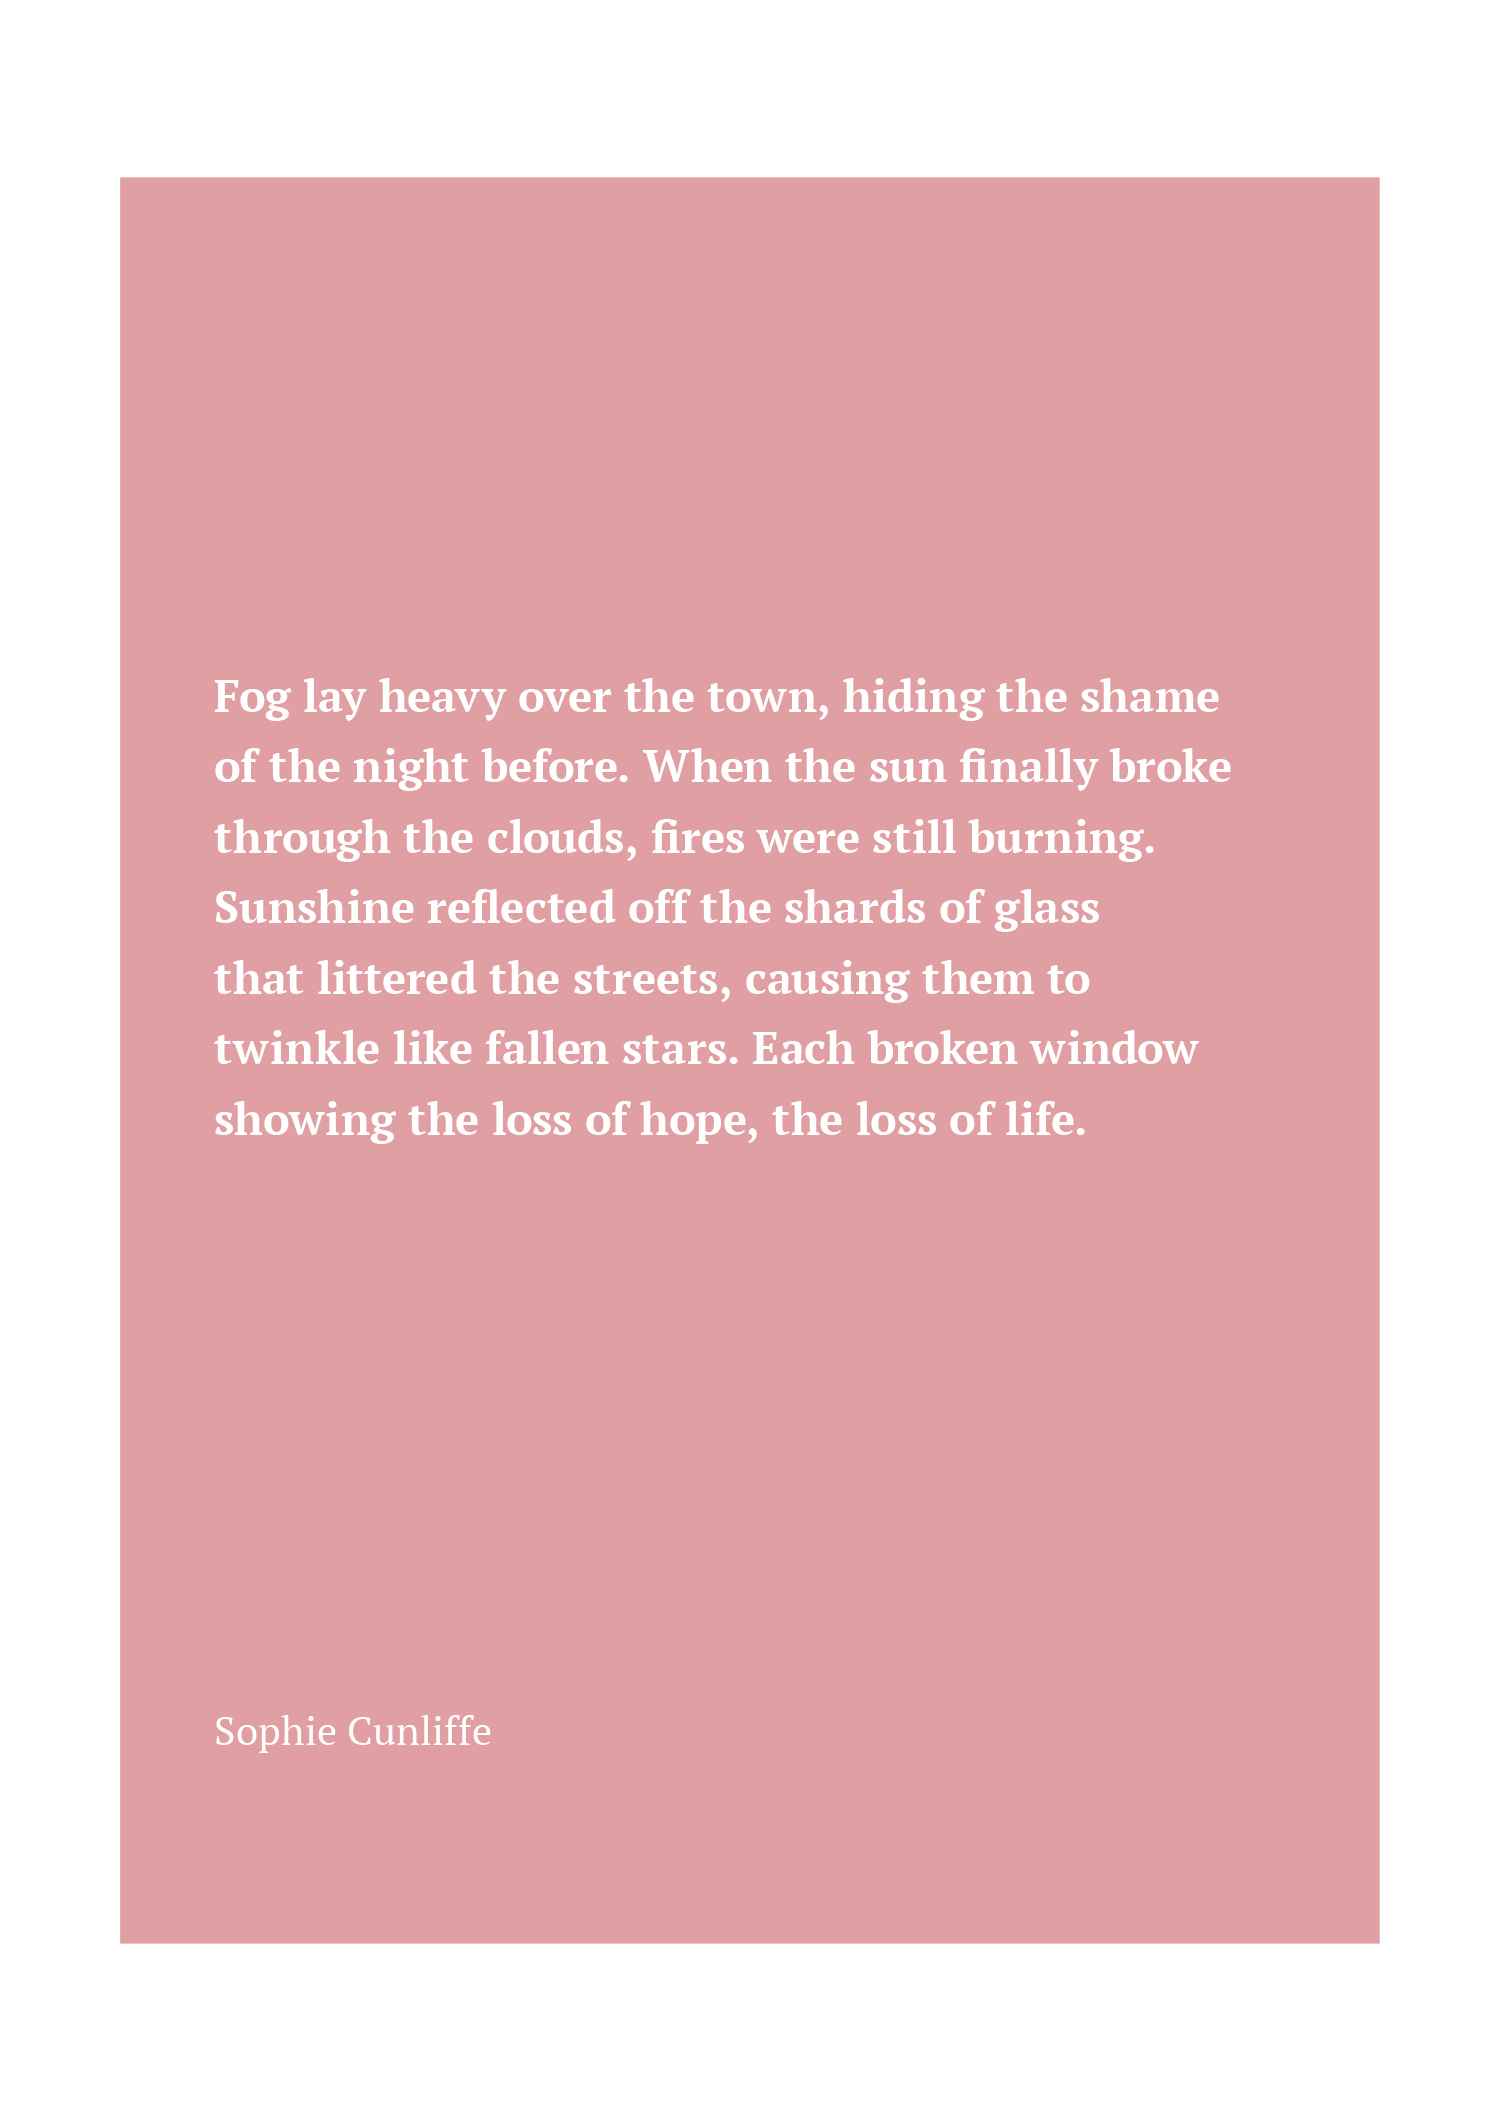 SophieCunliffe